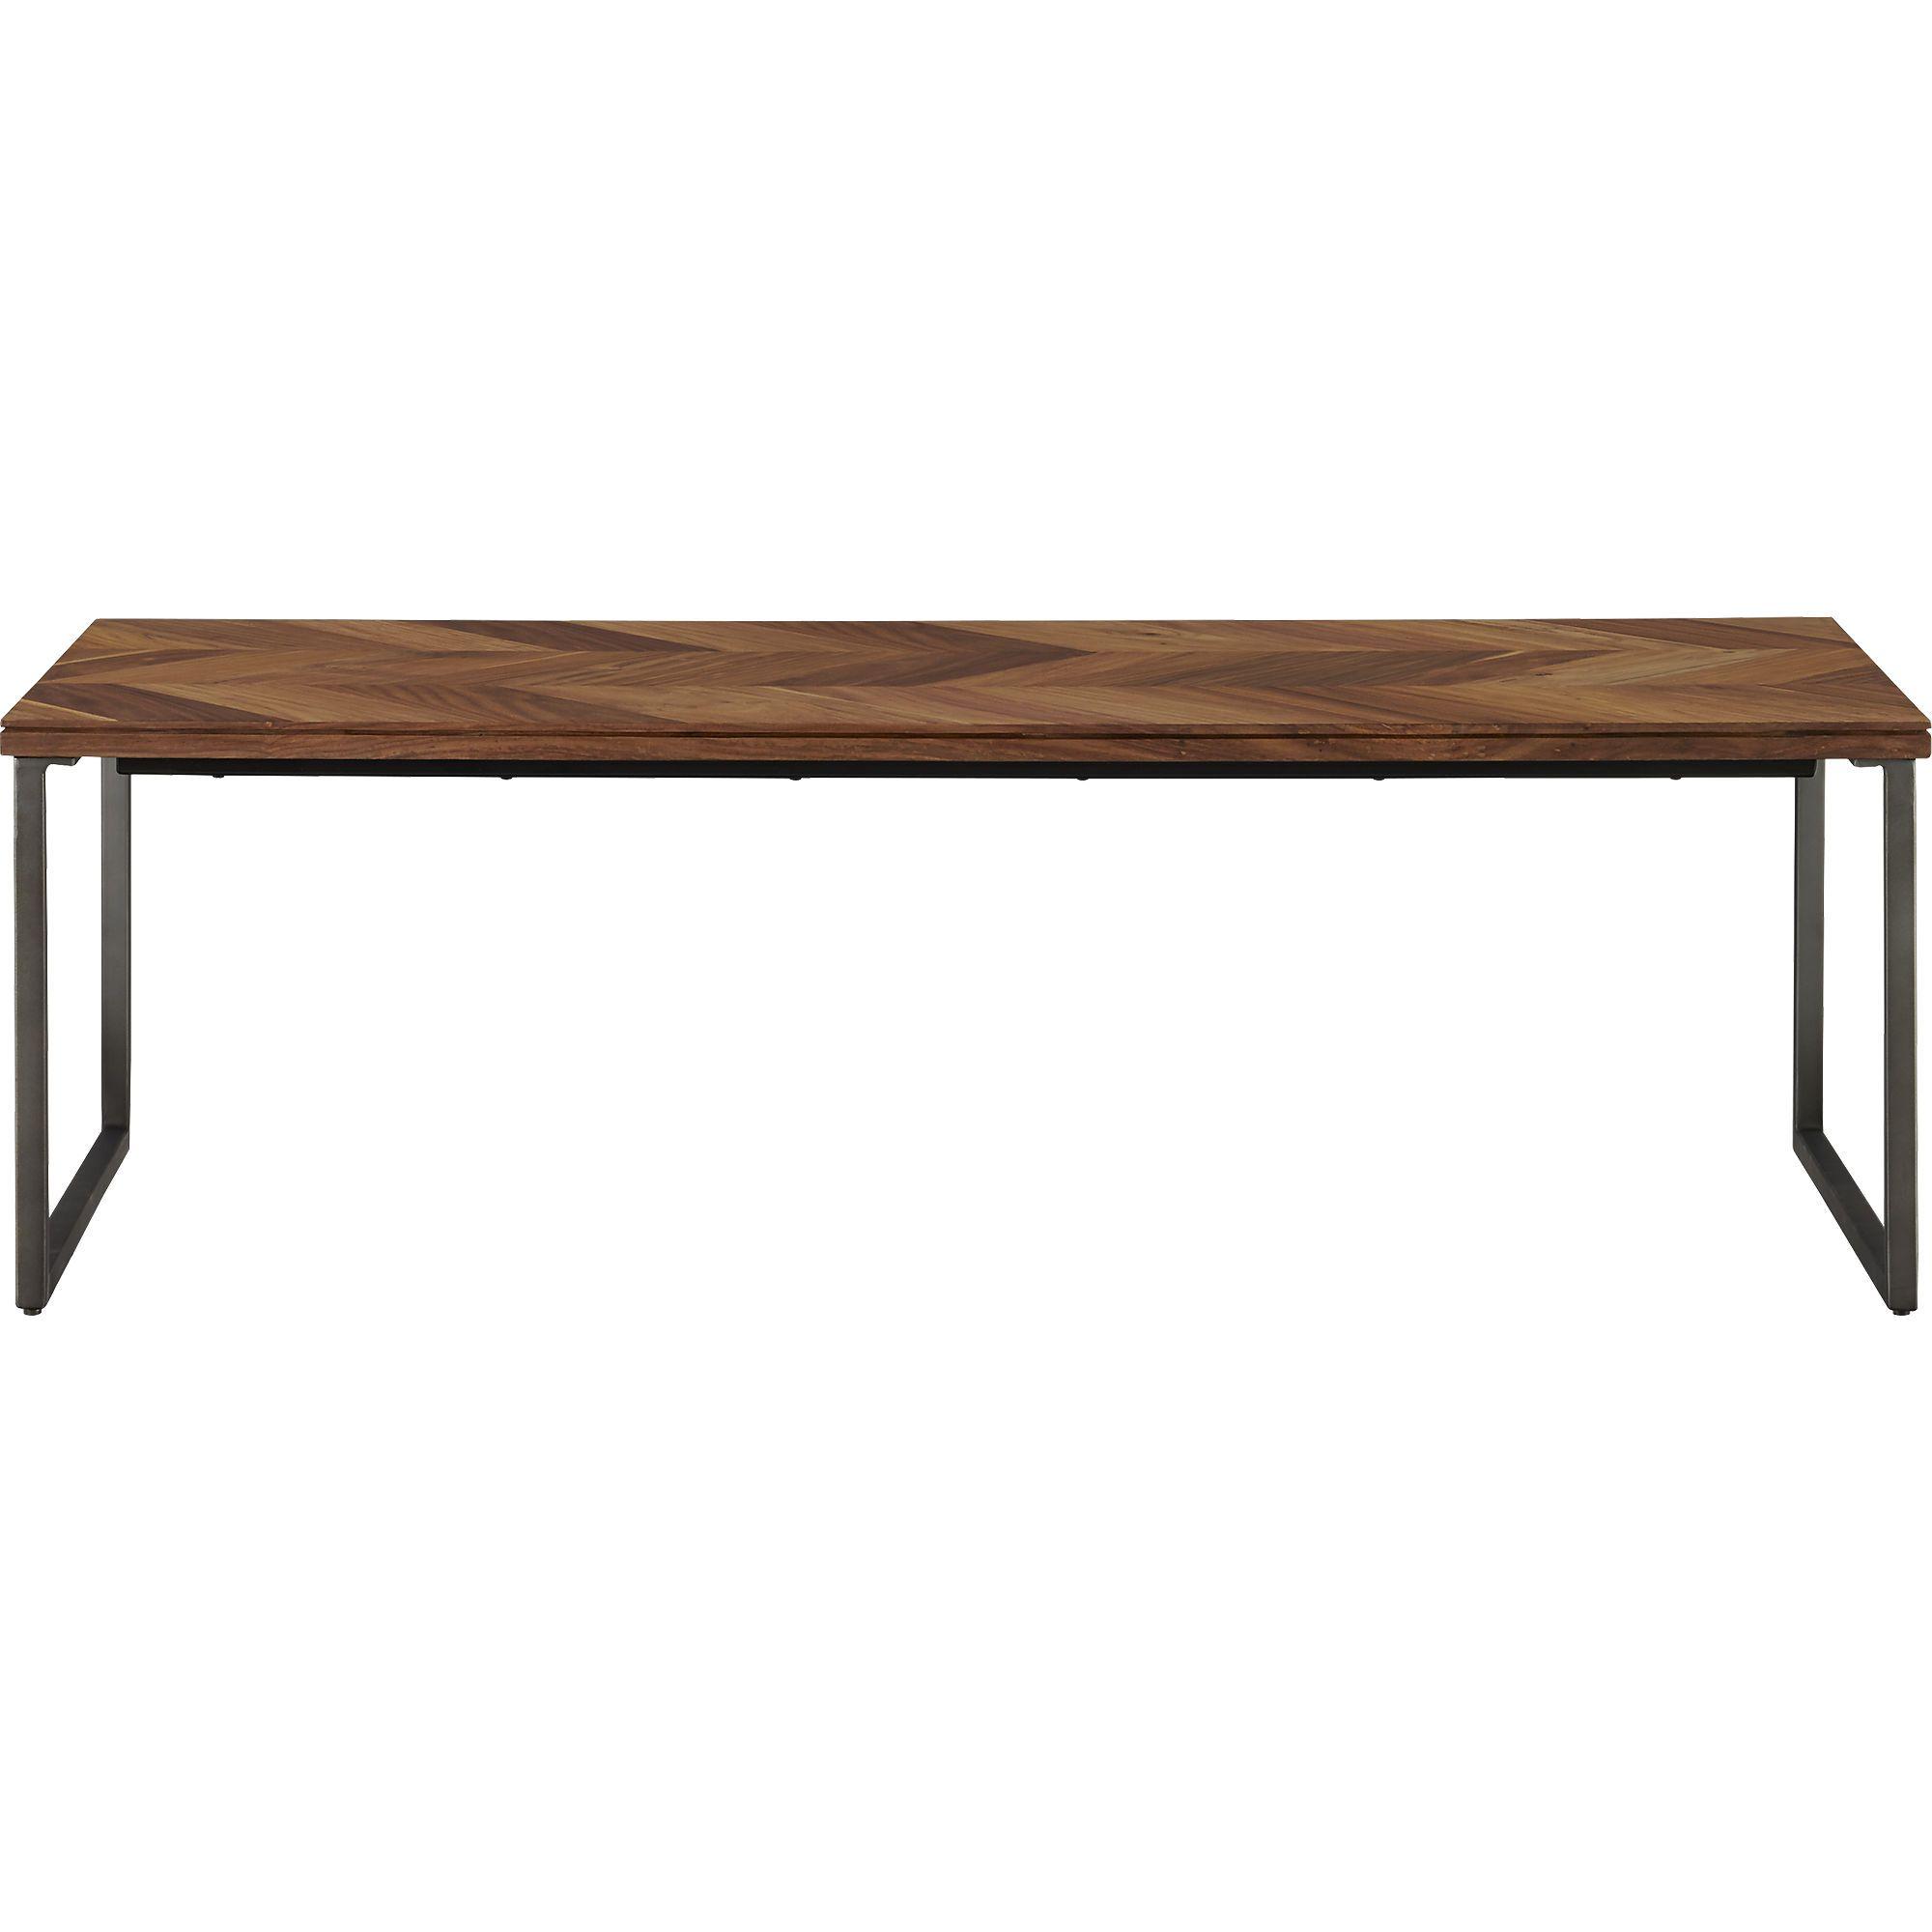 Astounding Chevron Coffee Table In View All Furniture Cb2 Keller Inzonedesignstudio Interior Chair Design Inzonedesignstudiocom